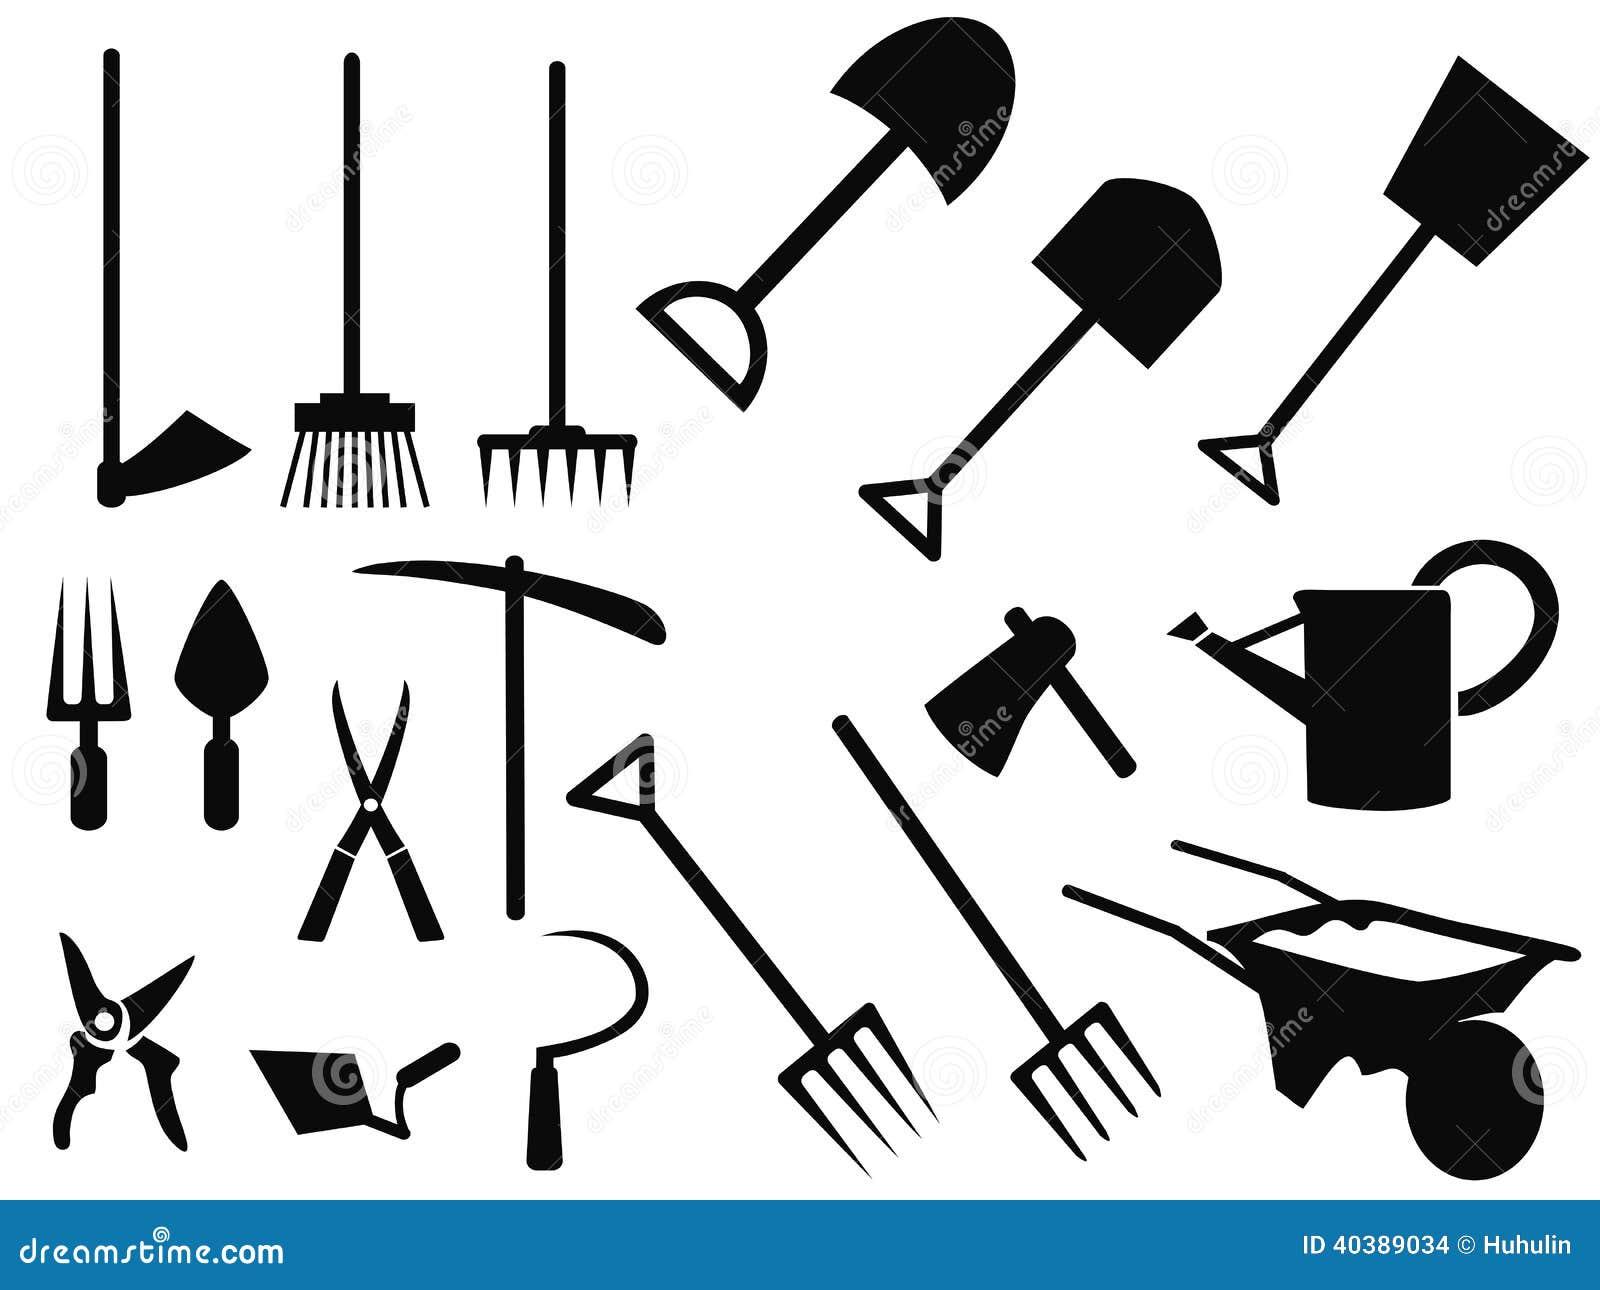 Gardening tools silhouette vector set stock vector image for Gardening tools vector